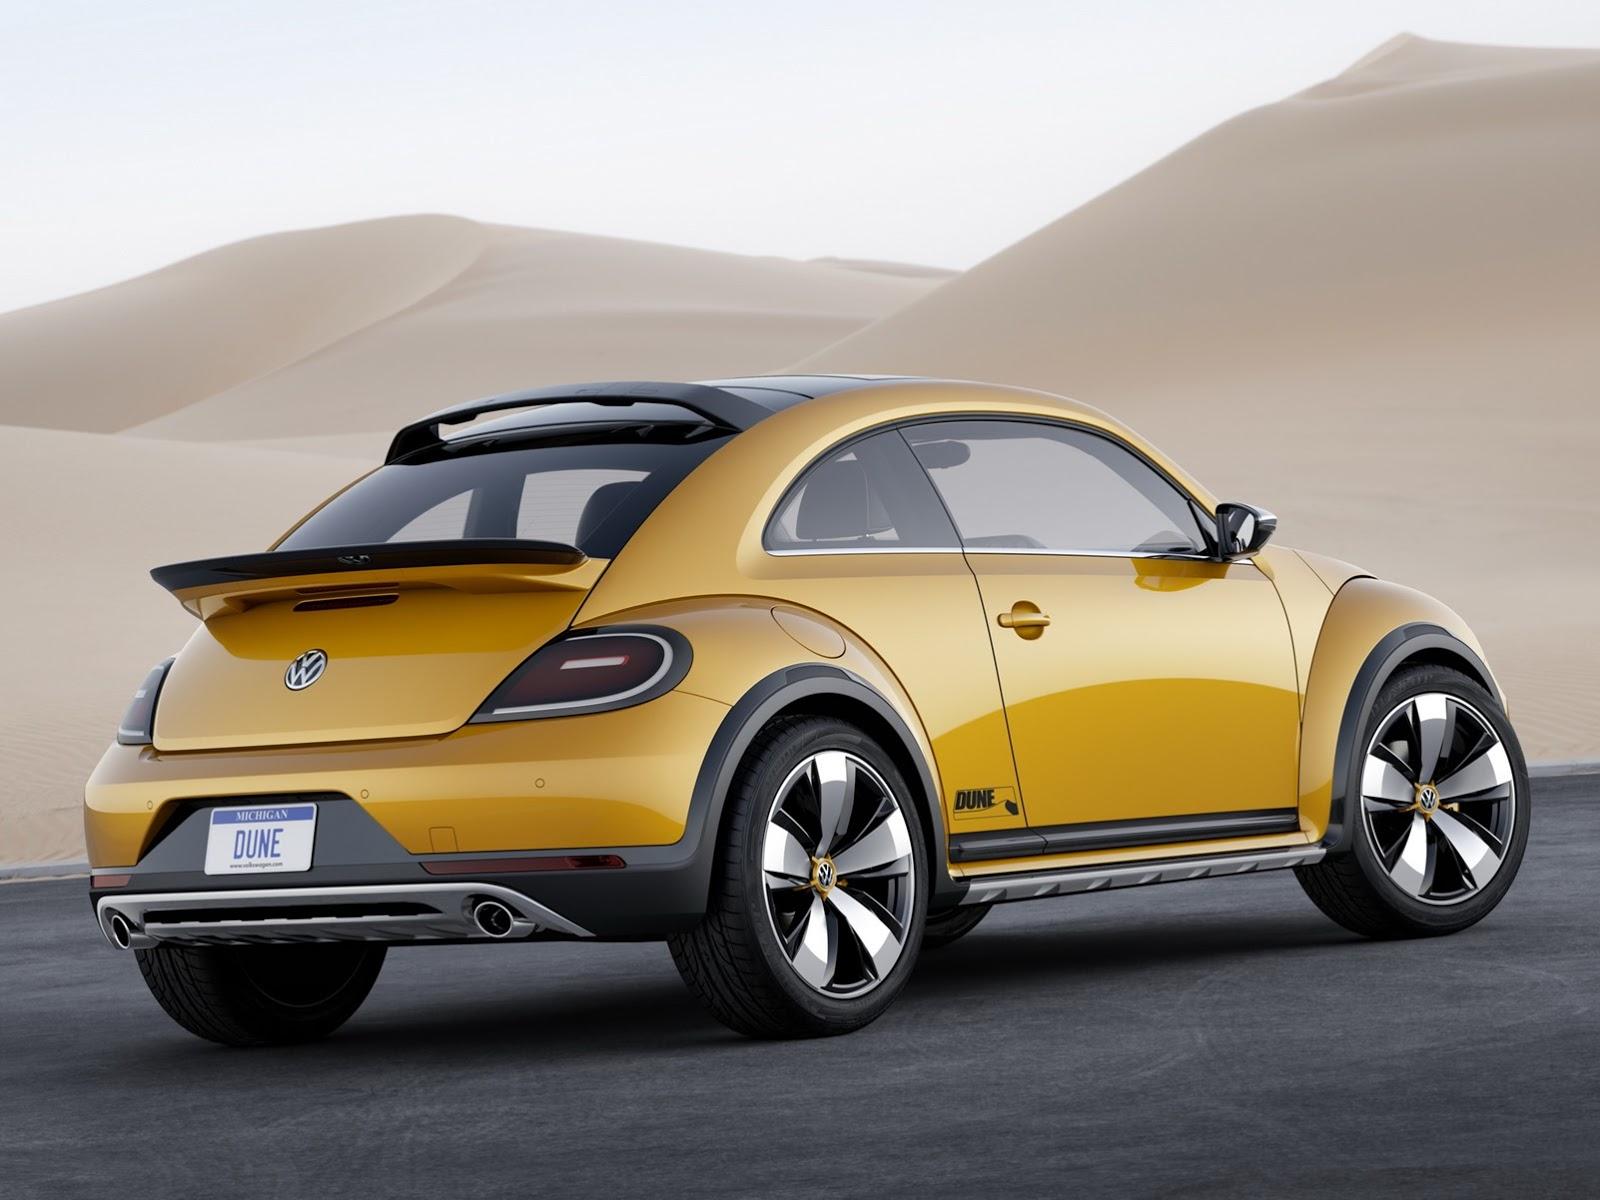 volkswagen beetle dune zellikleri foto galeri. Black Bedroom Furniture Sets. Home Design Ideas